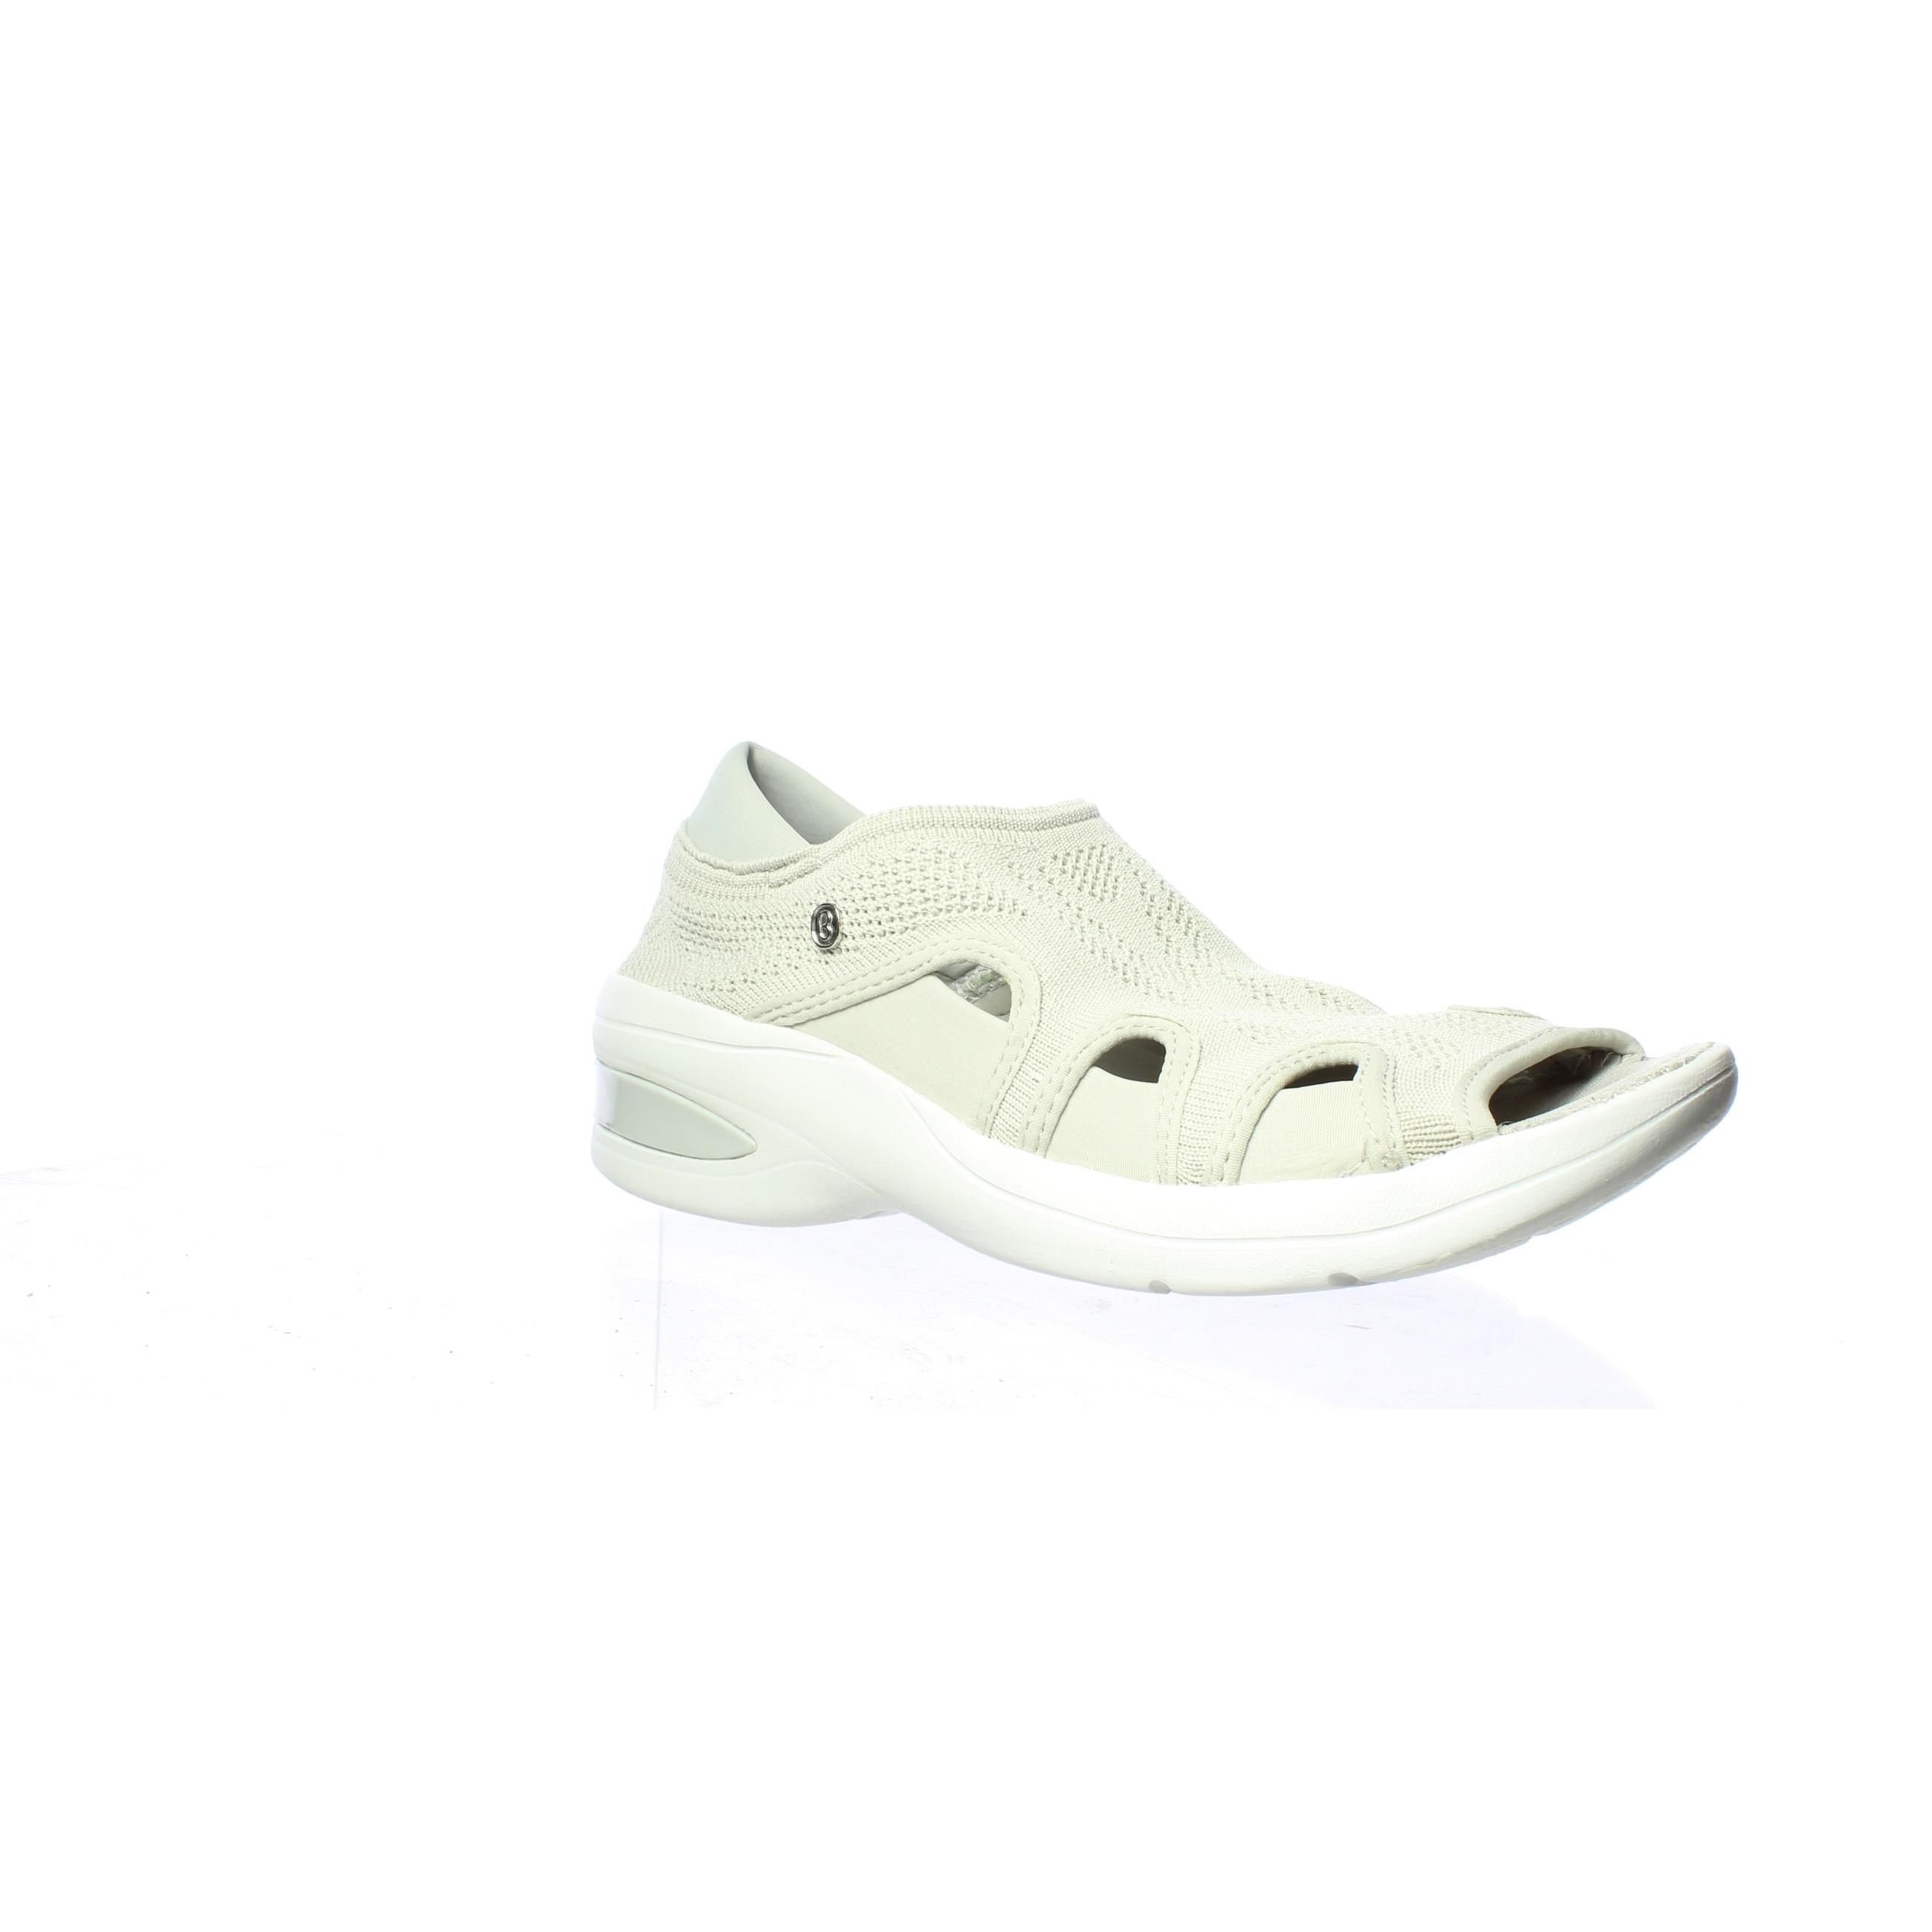 Bzees Womens Resort Beige Sandals Size 6.5